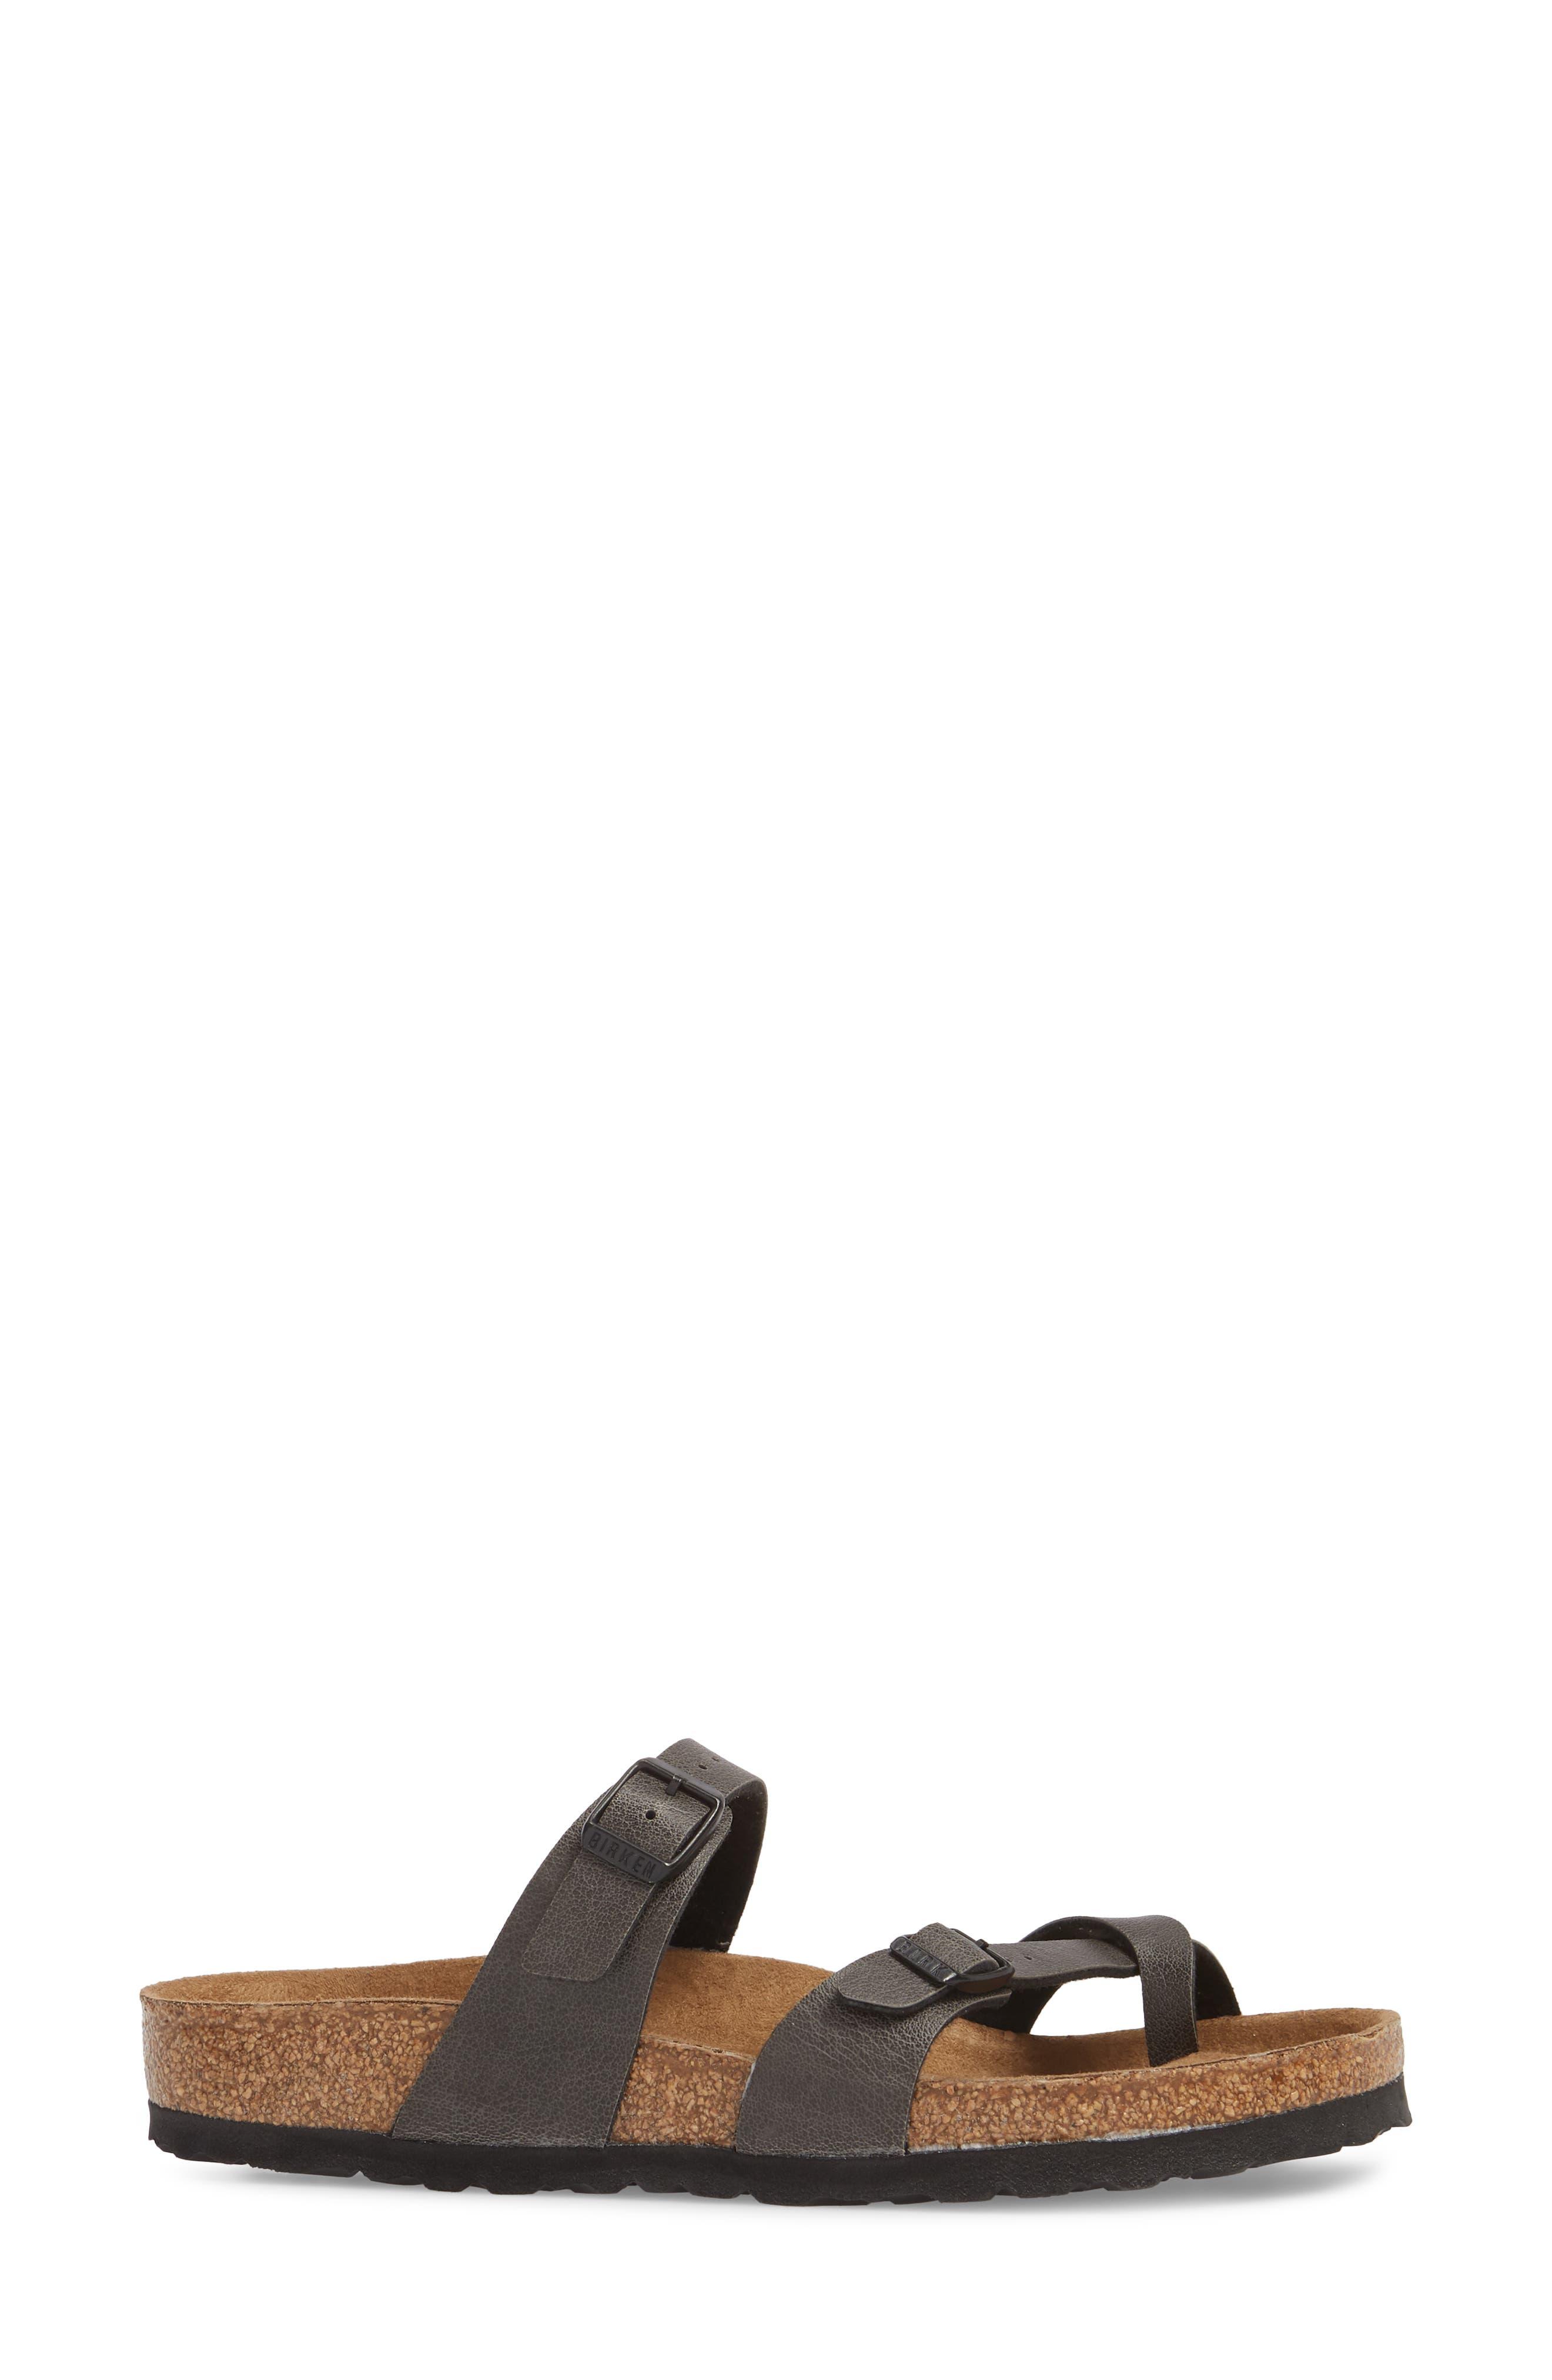 Mayari Birko-Flor<sup>™</sup> Slide Sandal,                             Alternate thumbnail 3, color,                             ANTHRACITE LEATHER